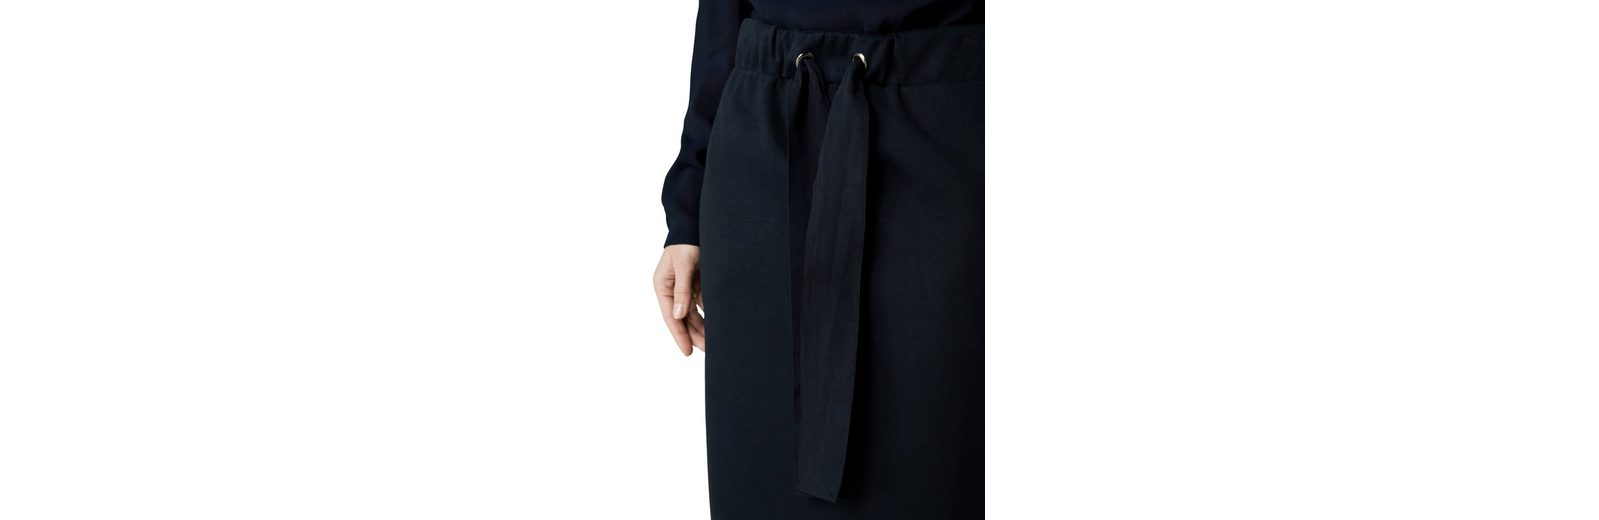 Super Angebote Verkauf Wie Viel Marc O'Polo Jerseyrock Ebay Auslass kj417NI